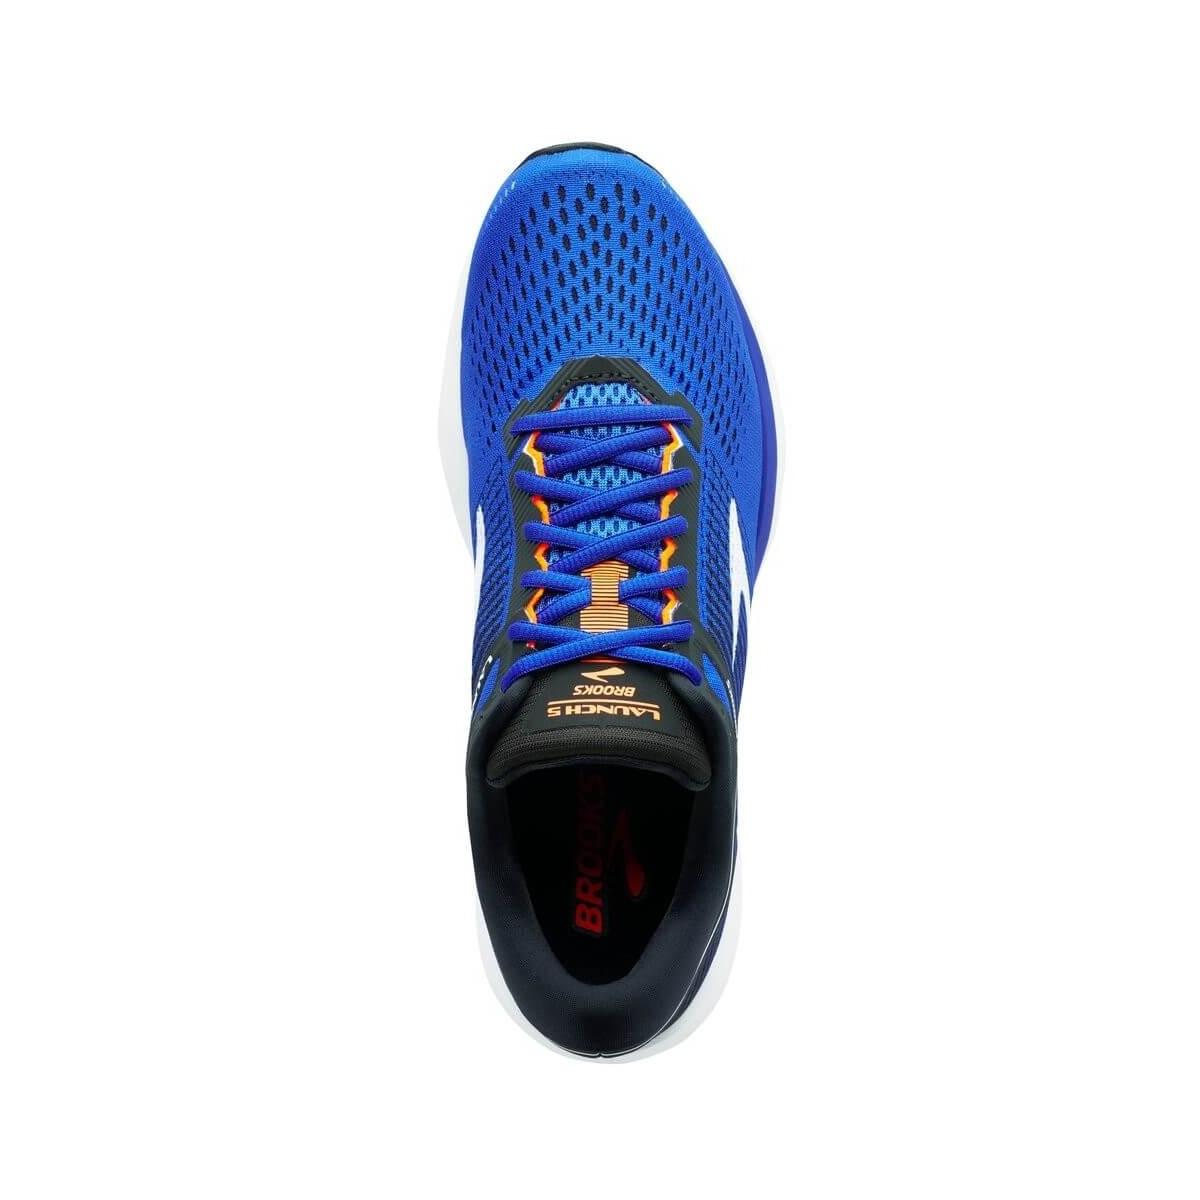 f955ea43313 ... Zapatillas Brooks Launch 5 Azul Negro Naranja Hombre PV18 ...